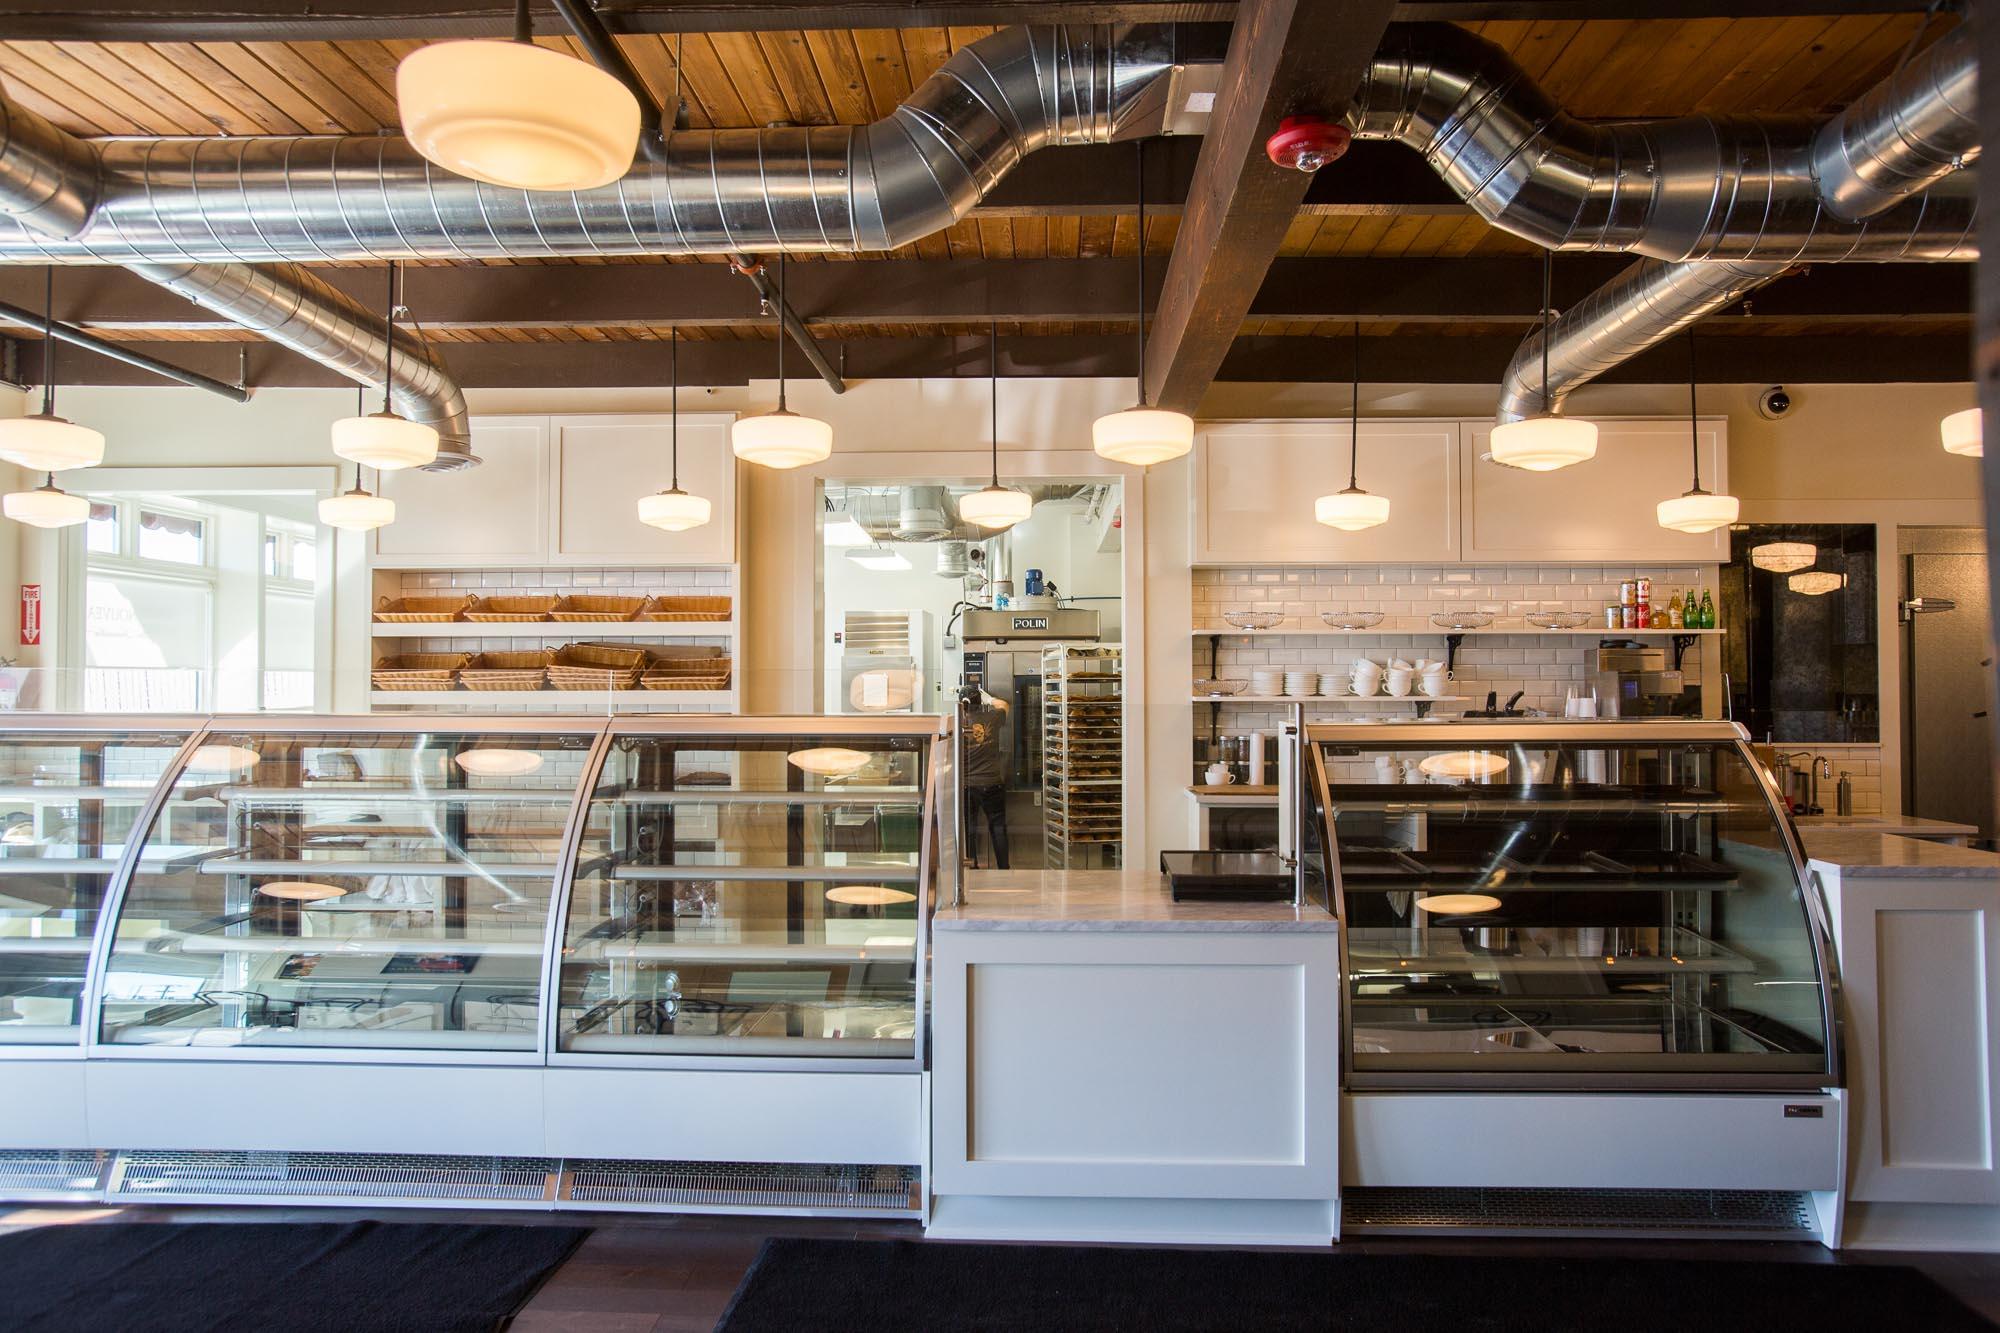 Bakery Nouveau S Beautiful New Burien Expansion Is Its